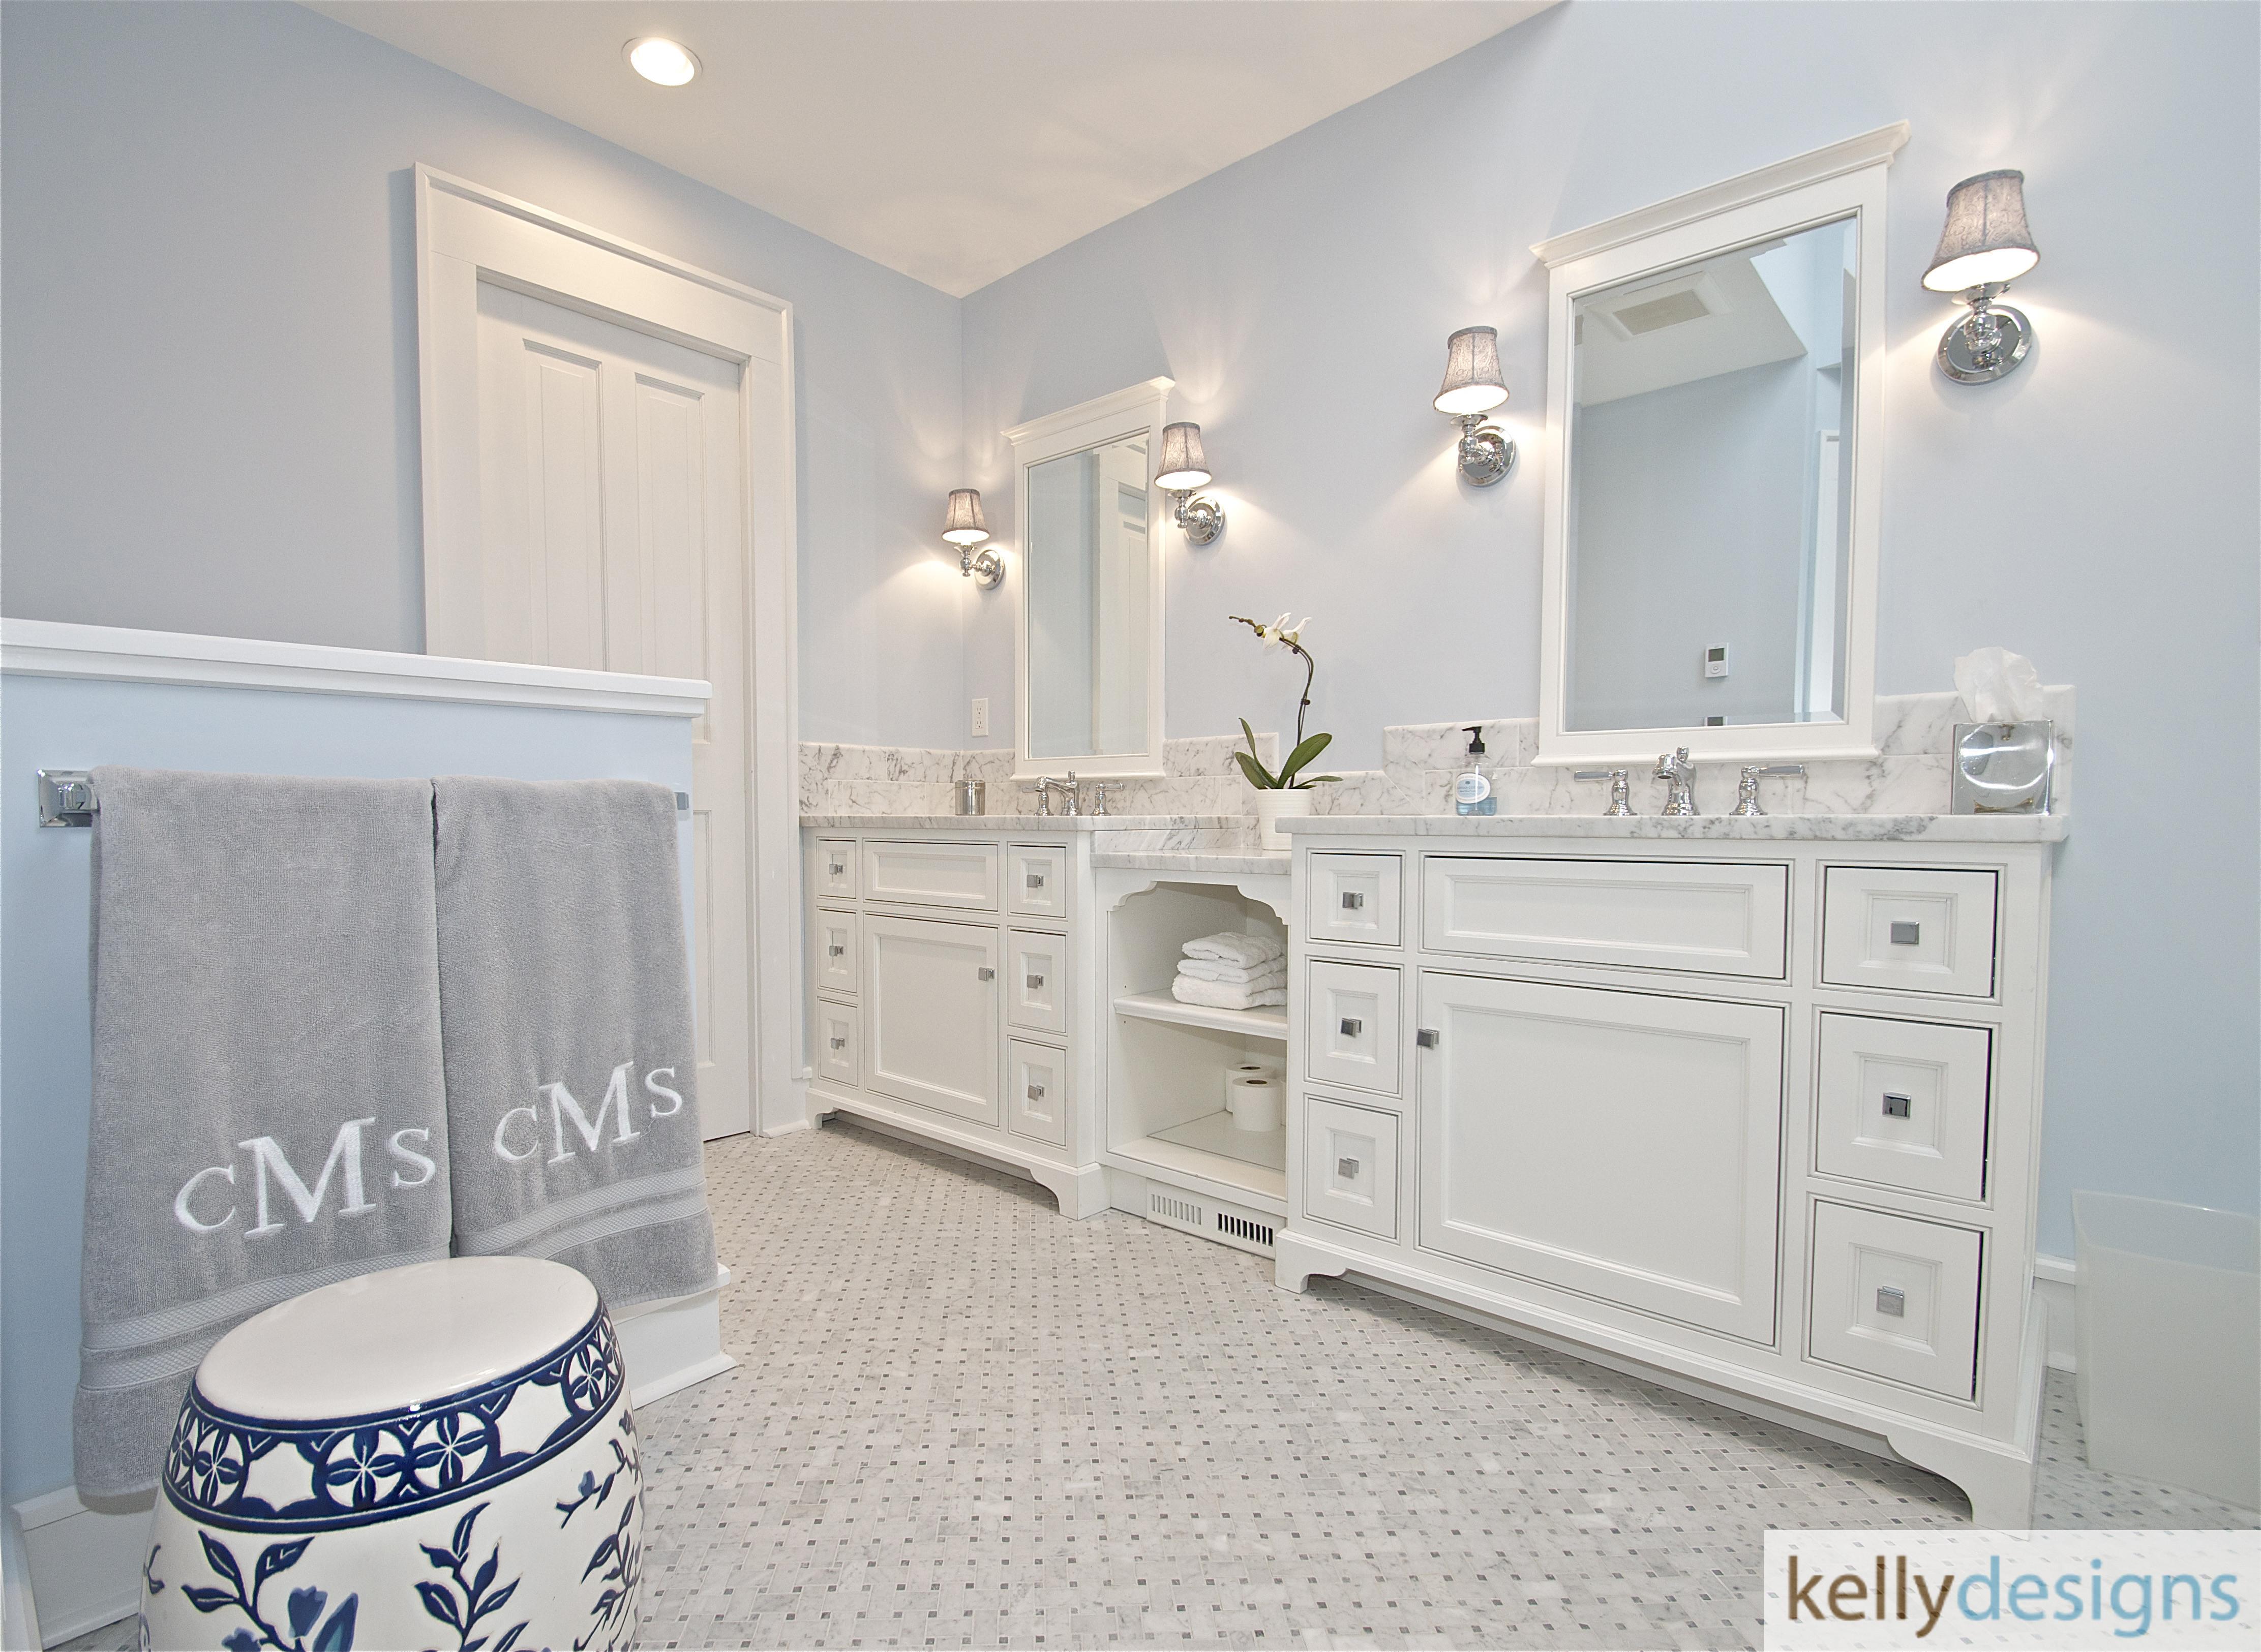 Redding Bath Remodel - Bathroom 3 - Interior Design by kellydesigns